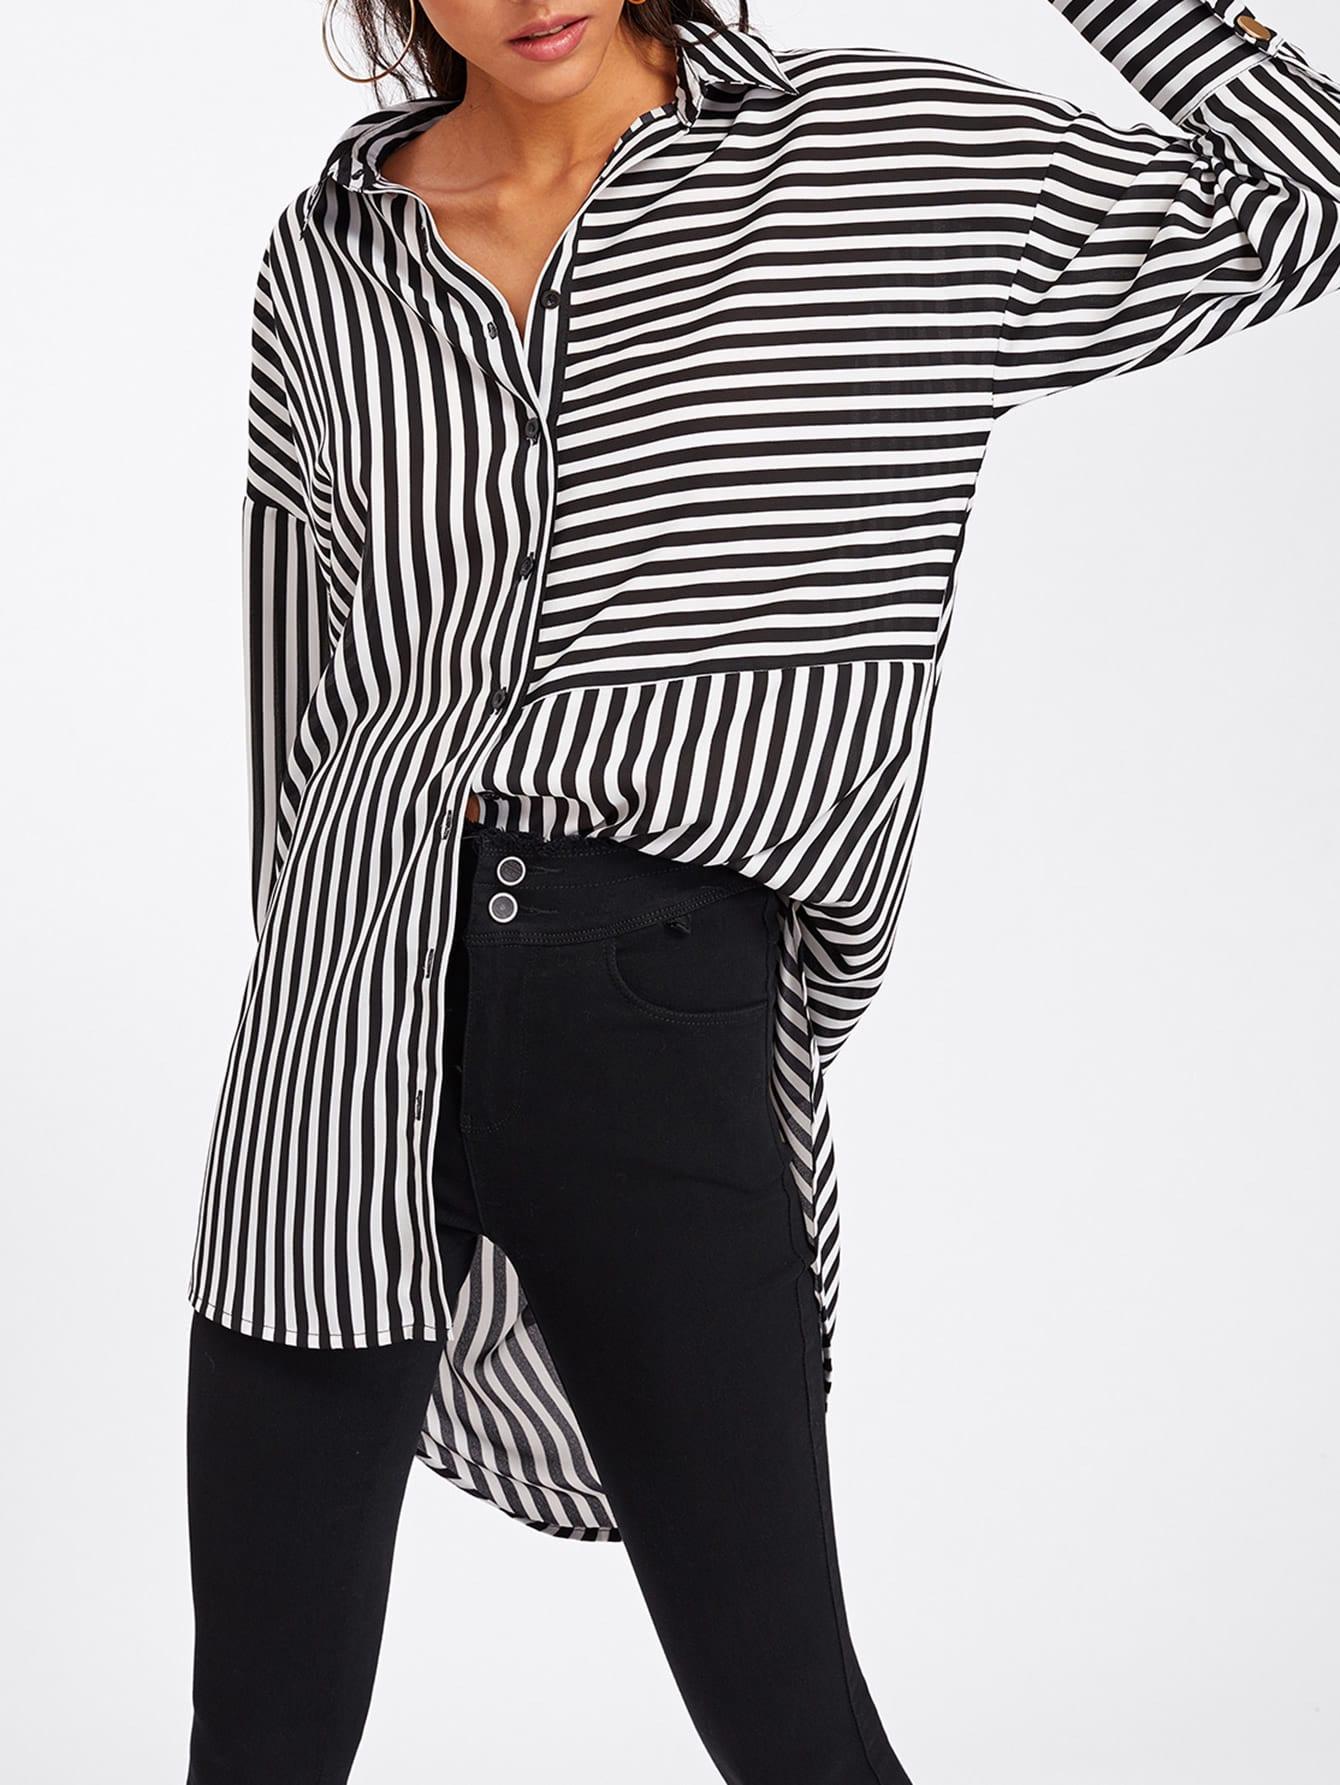 Dolphin Hem Mixed Stripe Shirt stepped hem mixed stripe shirt